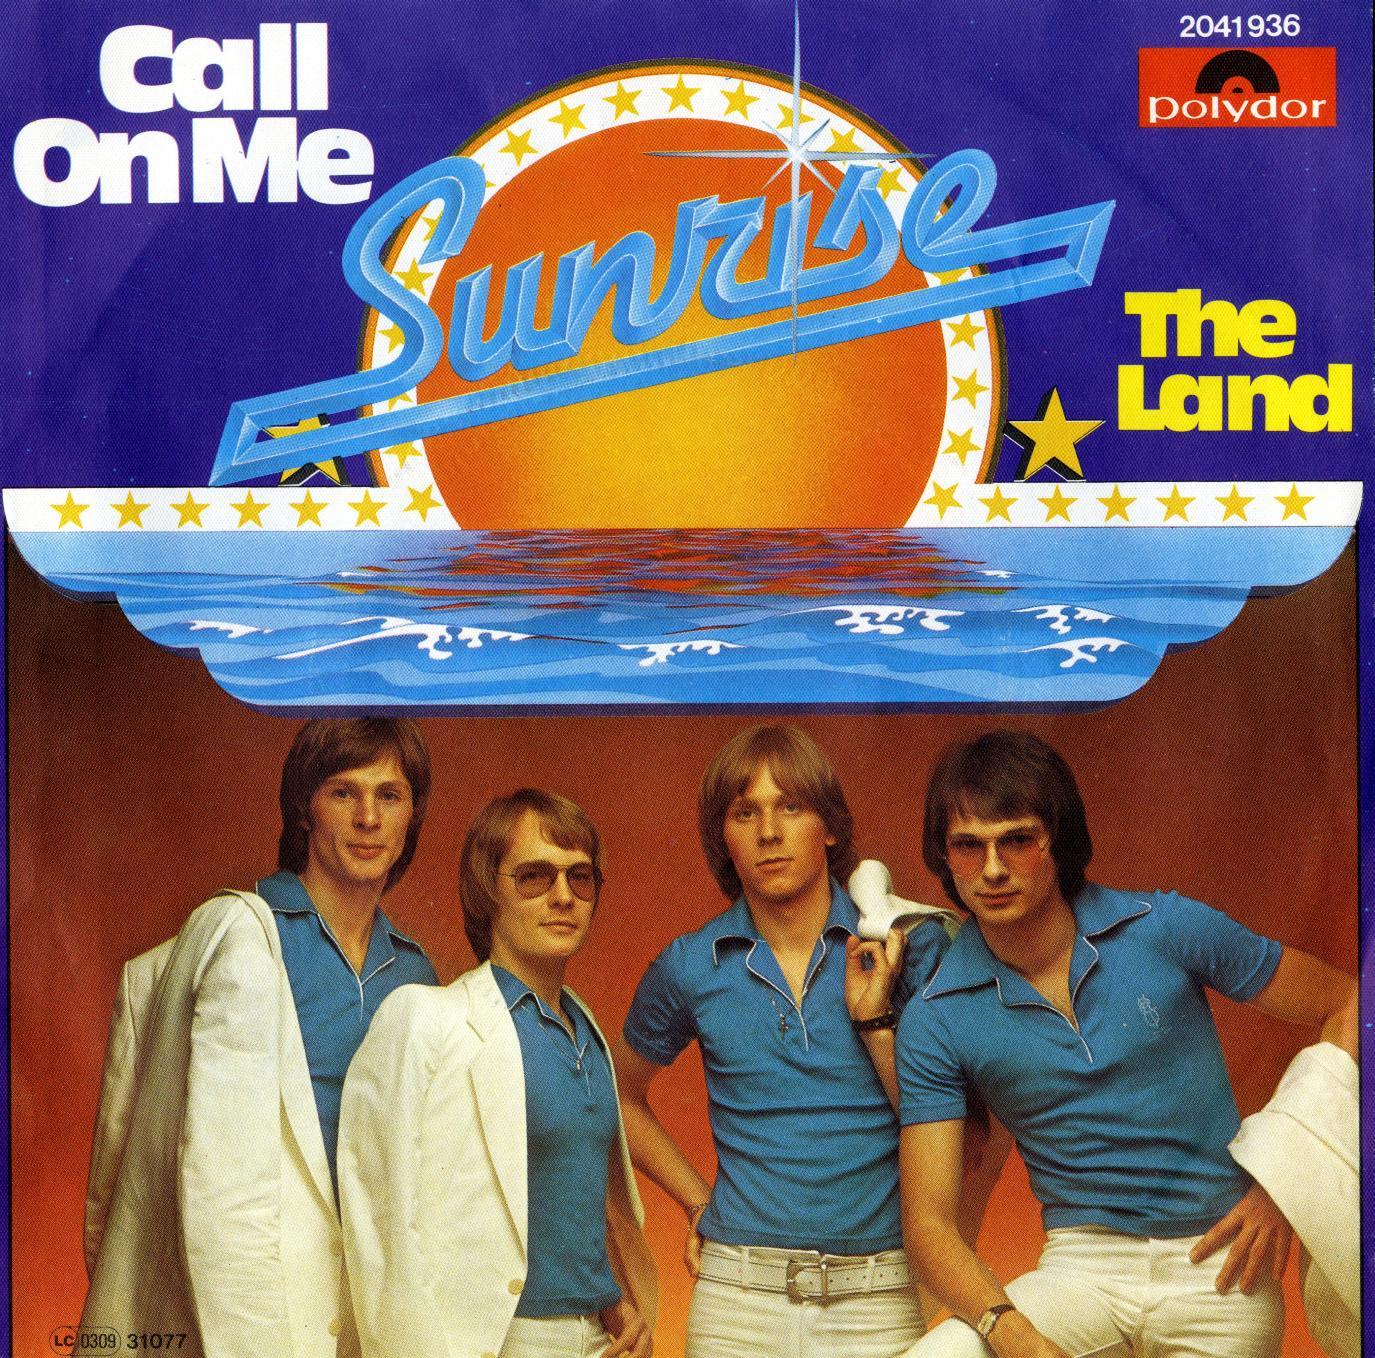 Cover: Call on me, Sunrise